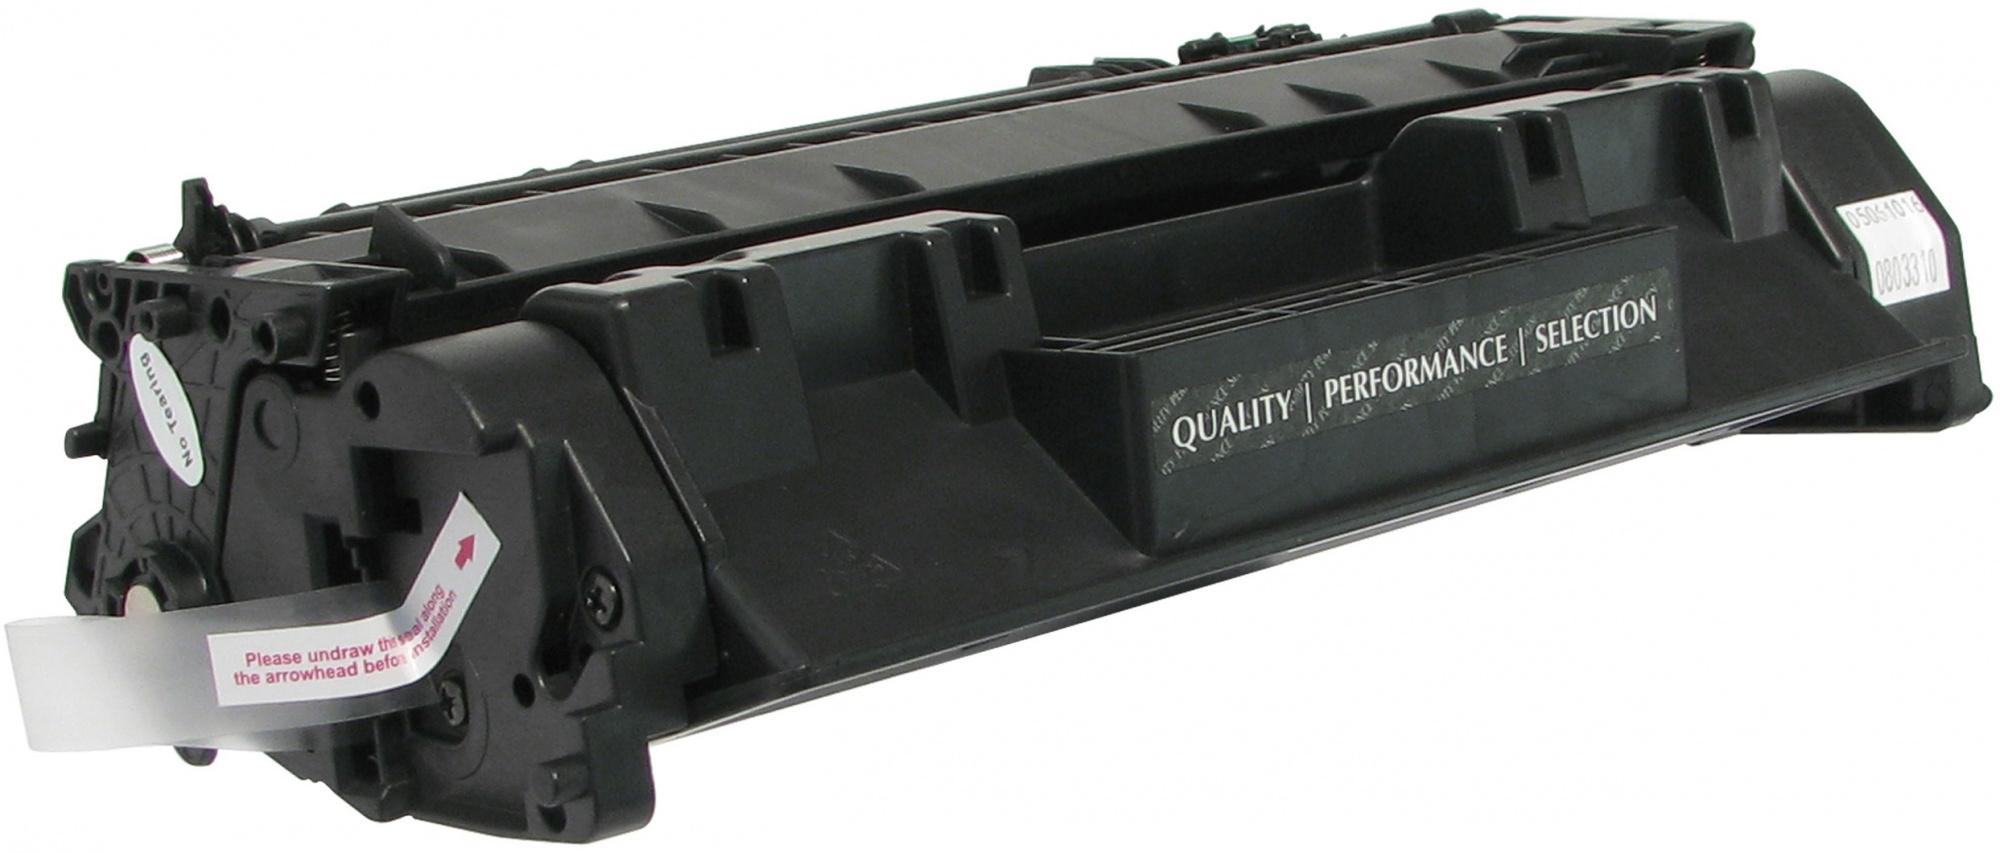 HP 05A (CE505A) - картридж для принтеров HP LaserJet P2035/P2055 (Black)Картриджи и тонеры<br>Картридж<br>